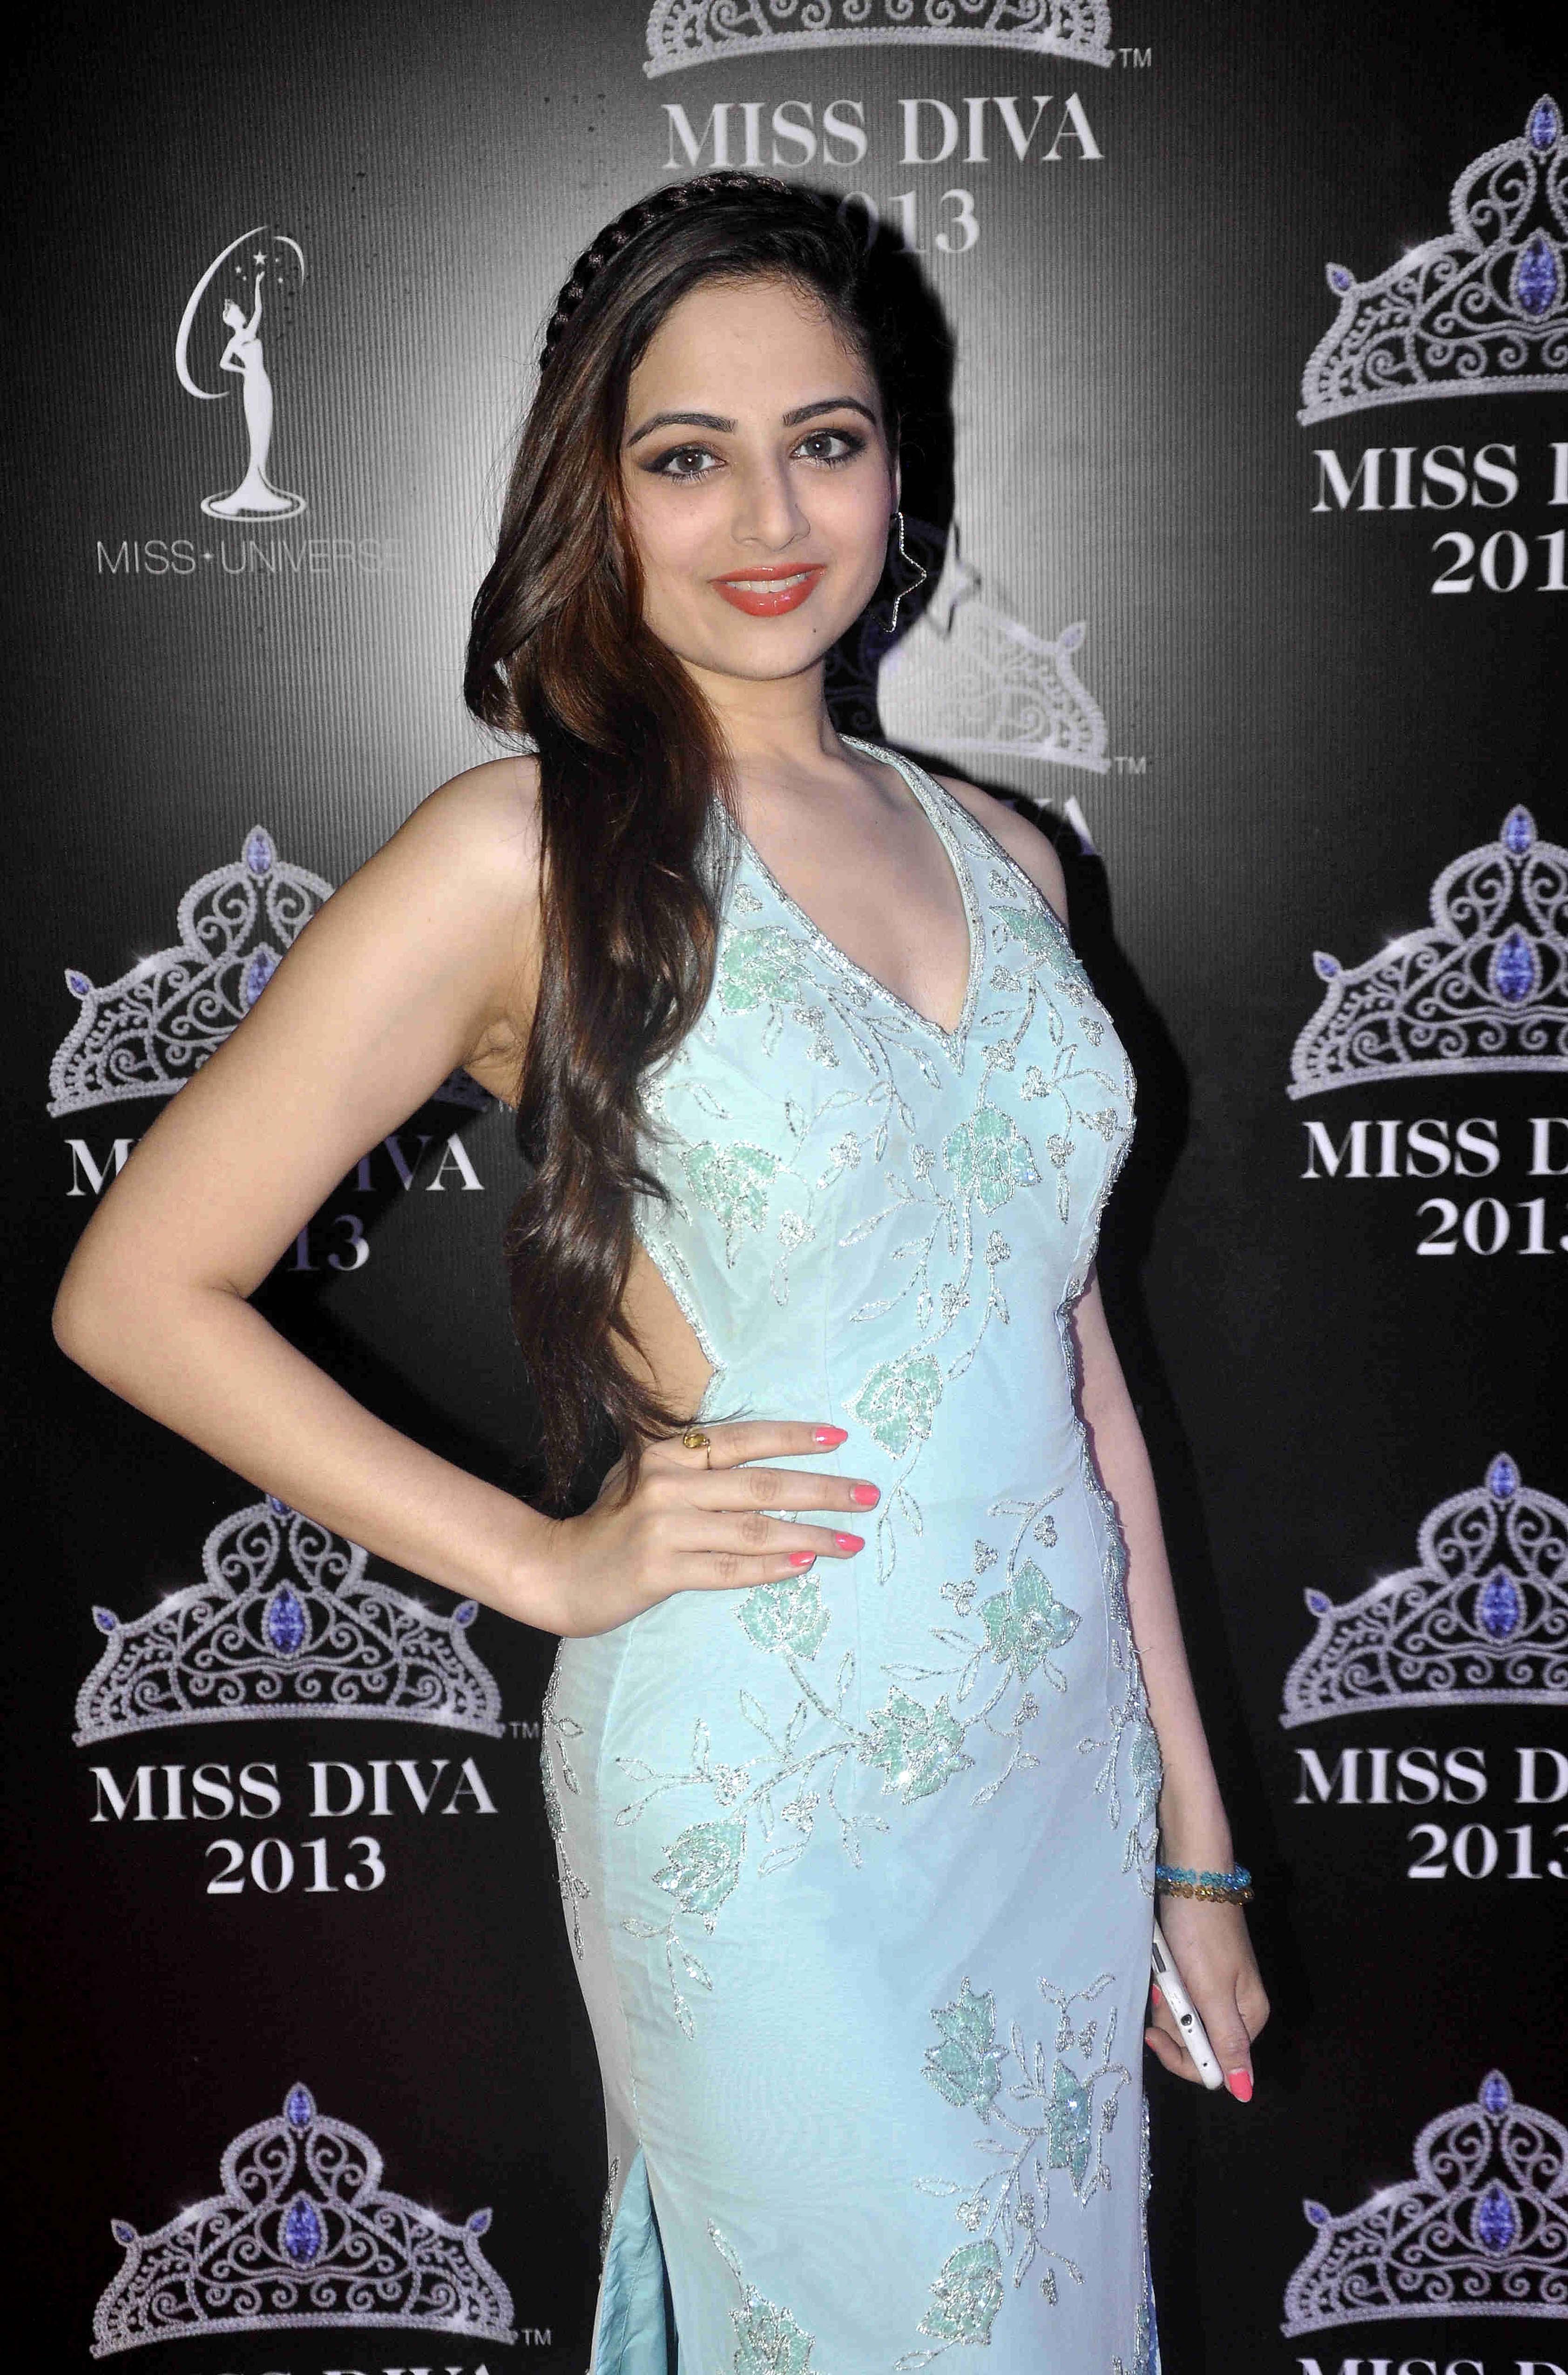 Miss Celebrity - Hair Salon - Horodenka - 2 Reviews - 78 ...